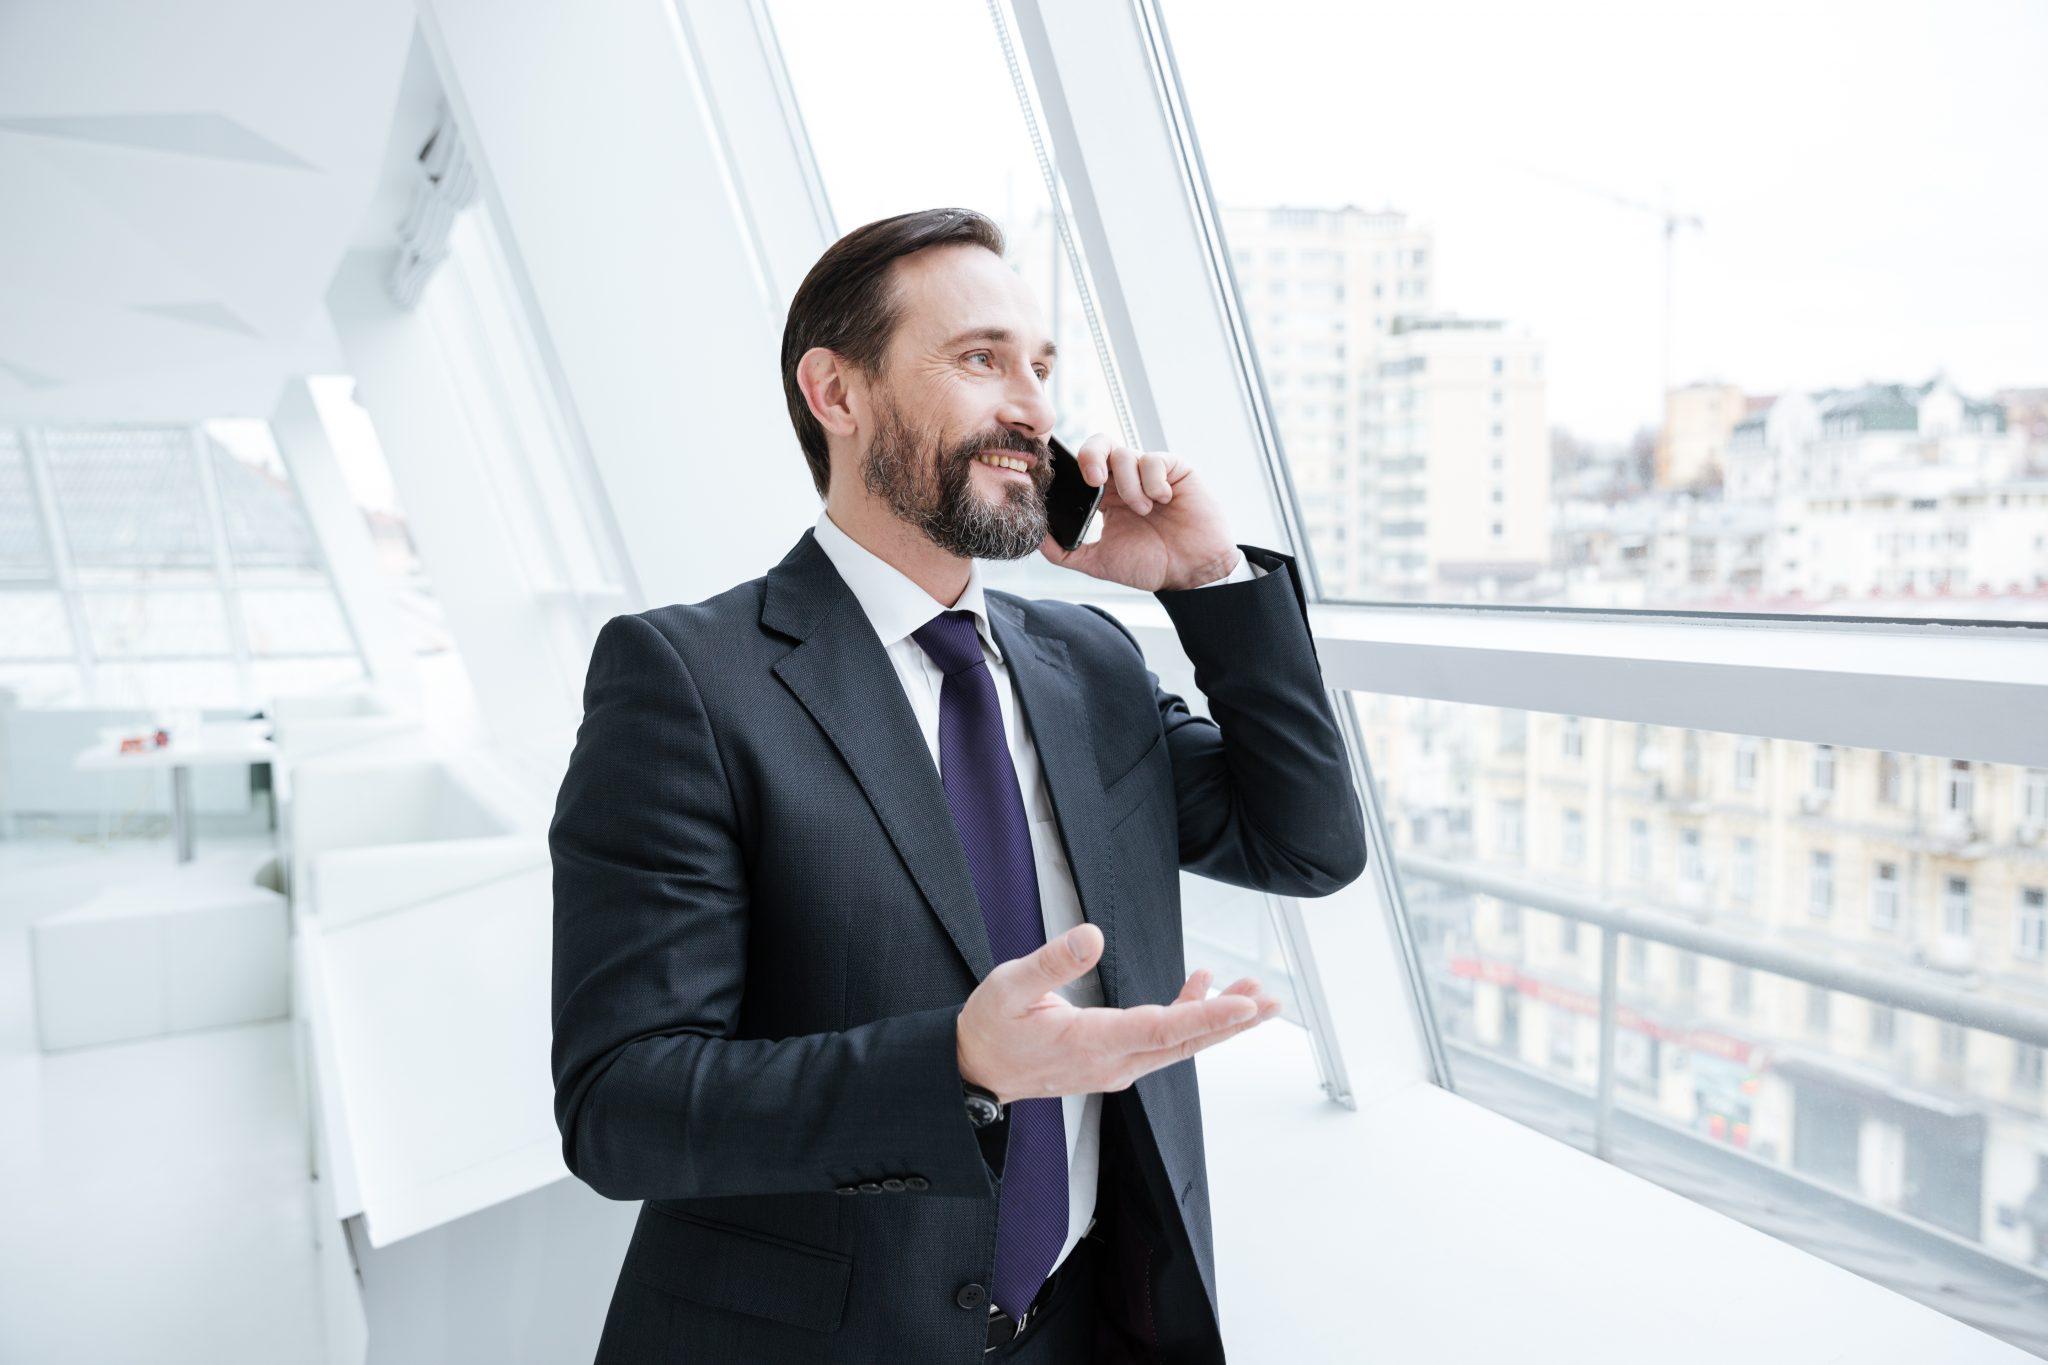 Voice, Video & Mobile Communications Enterprise IT Services 844-487-7283 https://www.arnettgroup.net